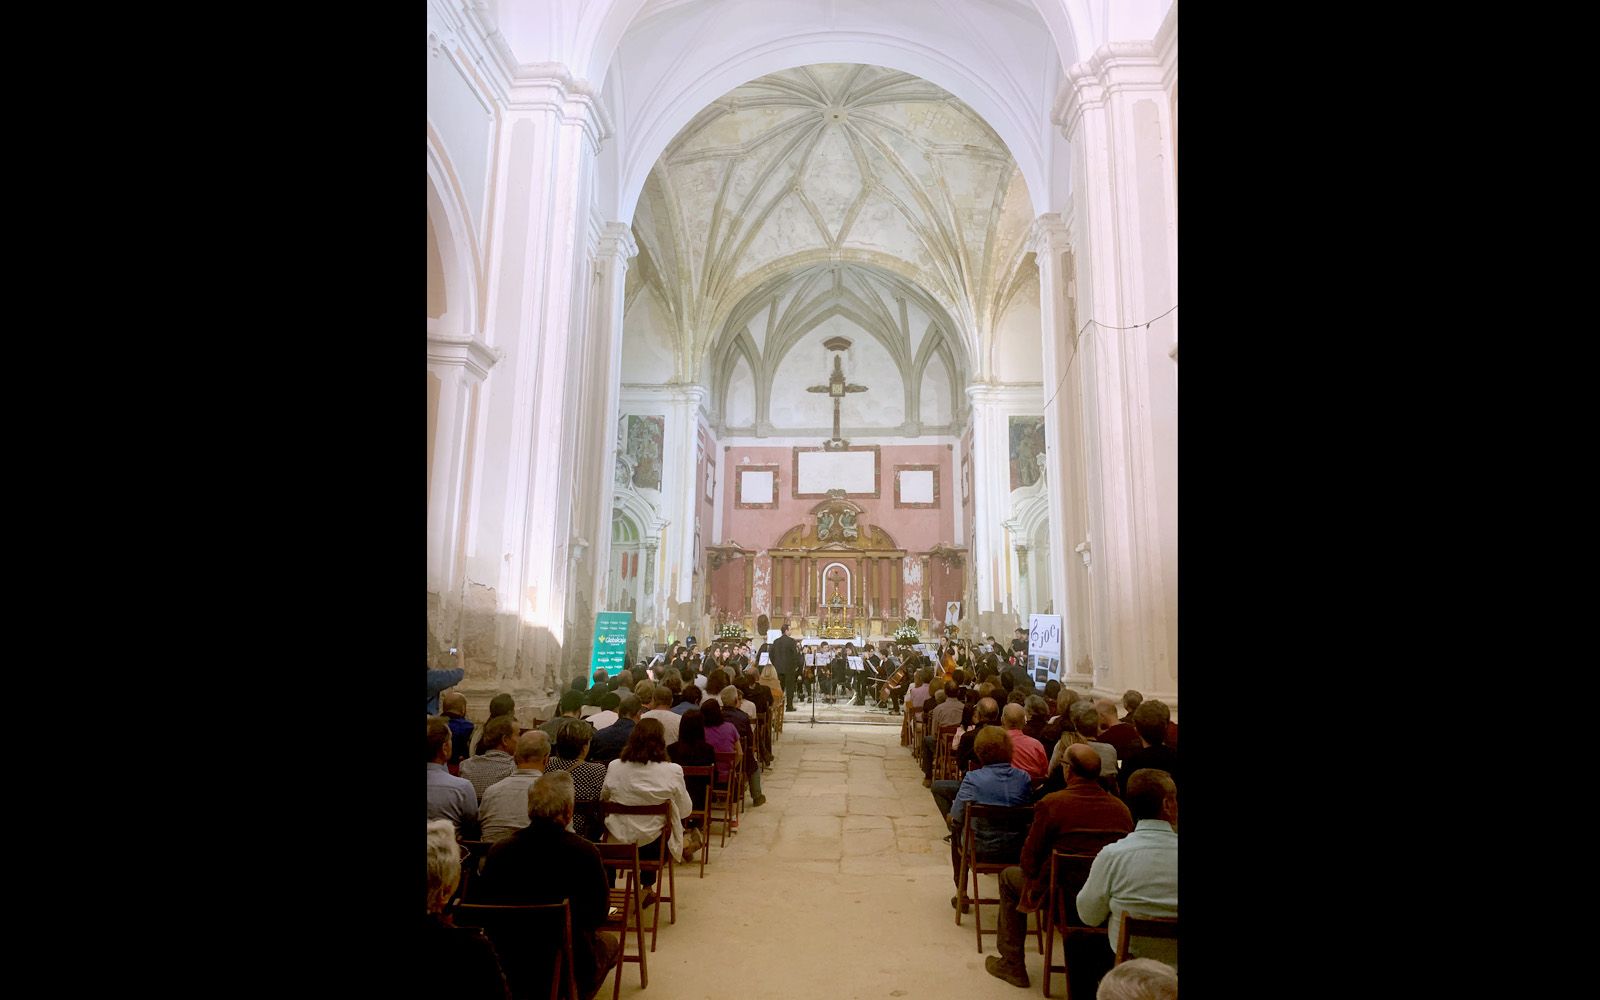 https://blog.globalcaja.es/wp-content/uploads/2019/05/Concierto-carboneras.jpg